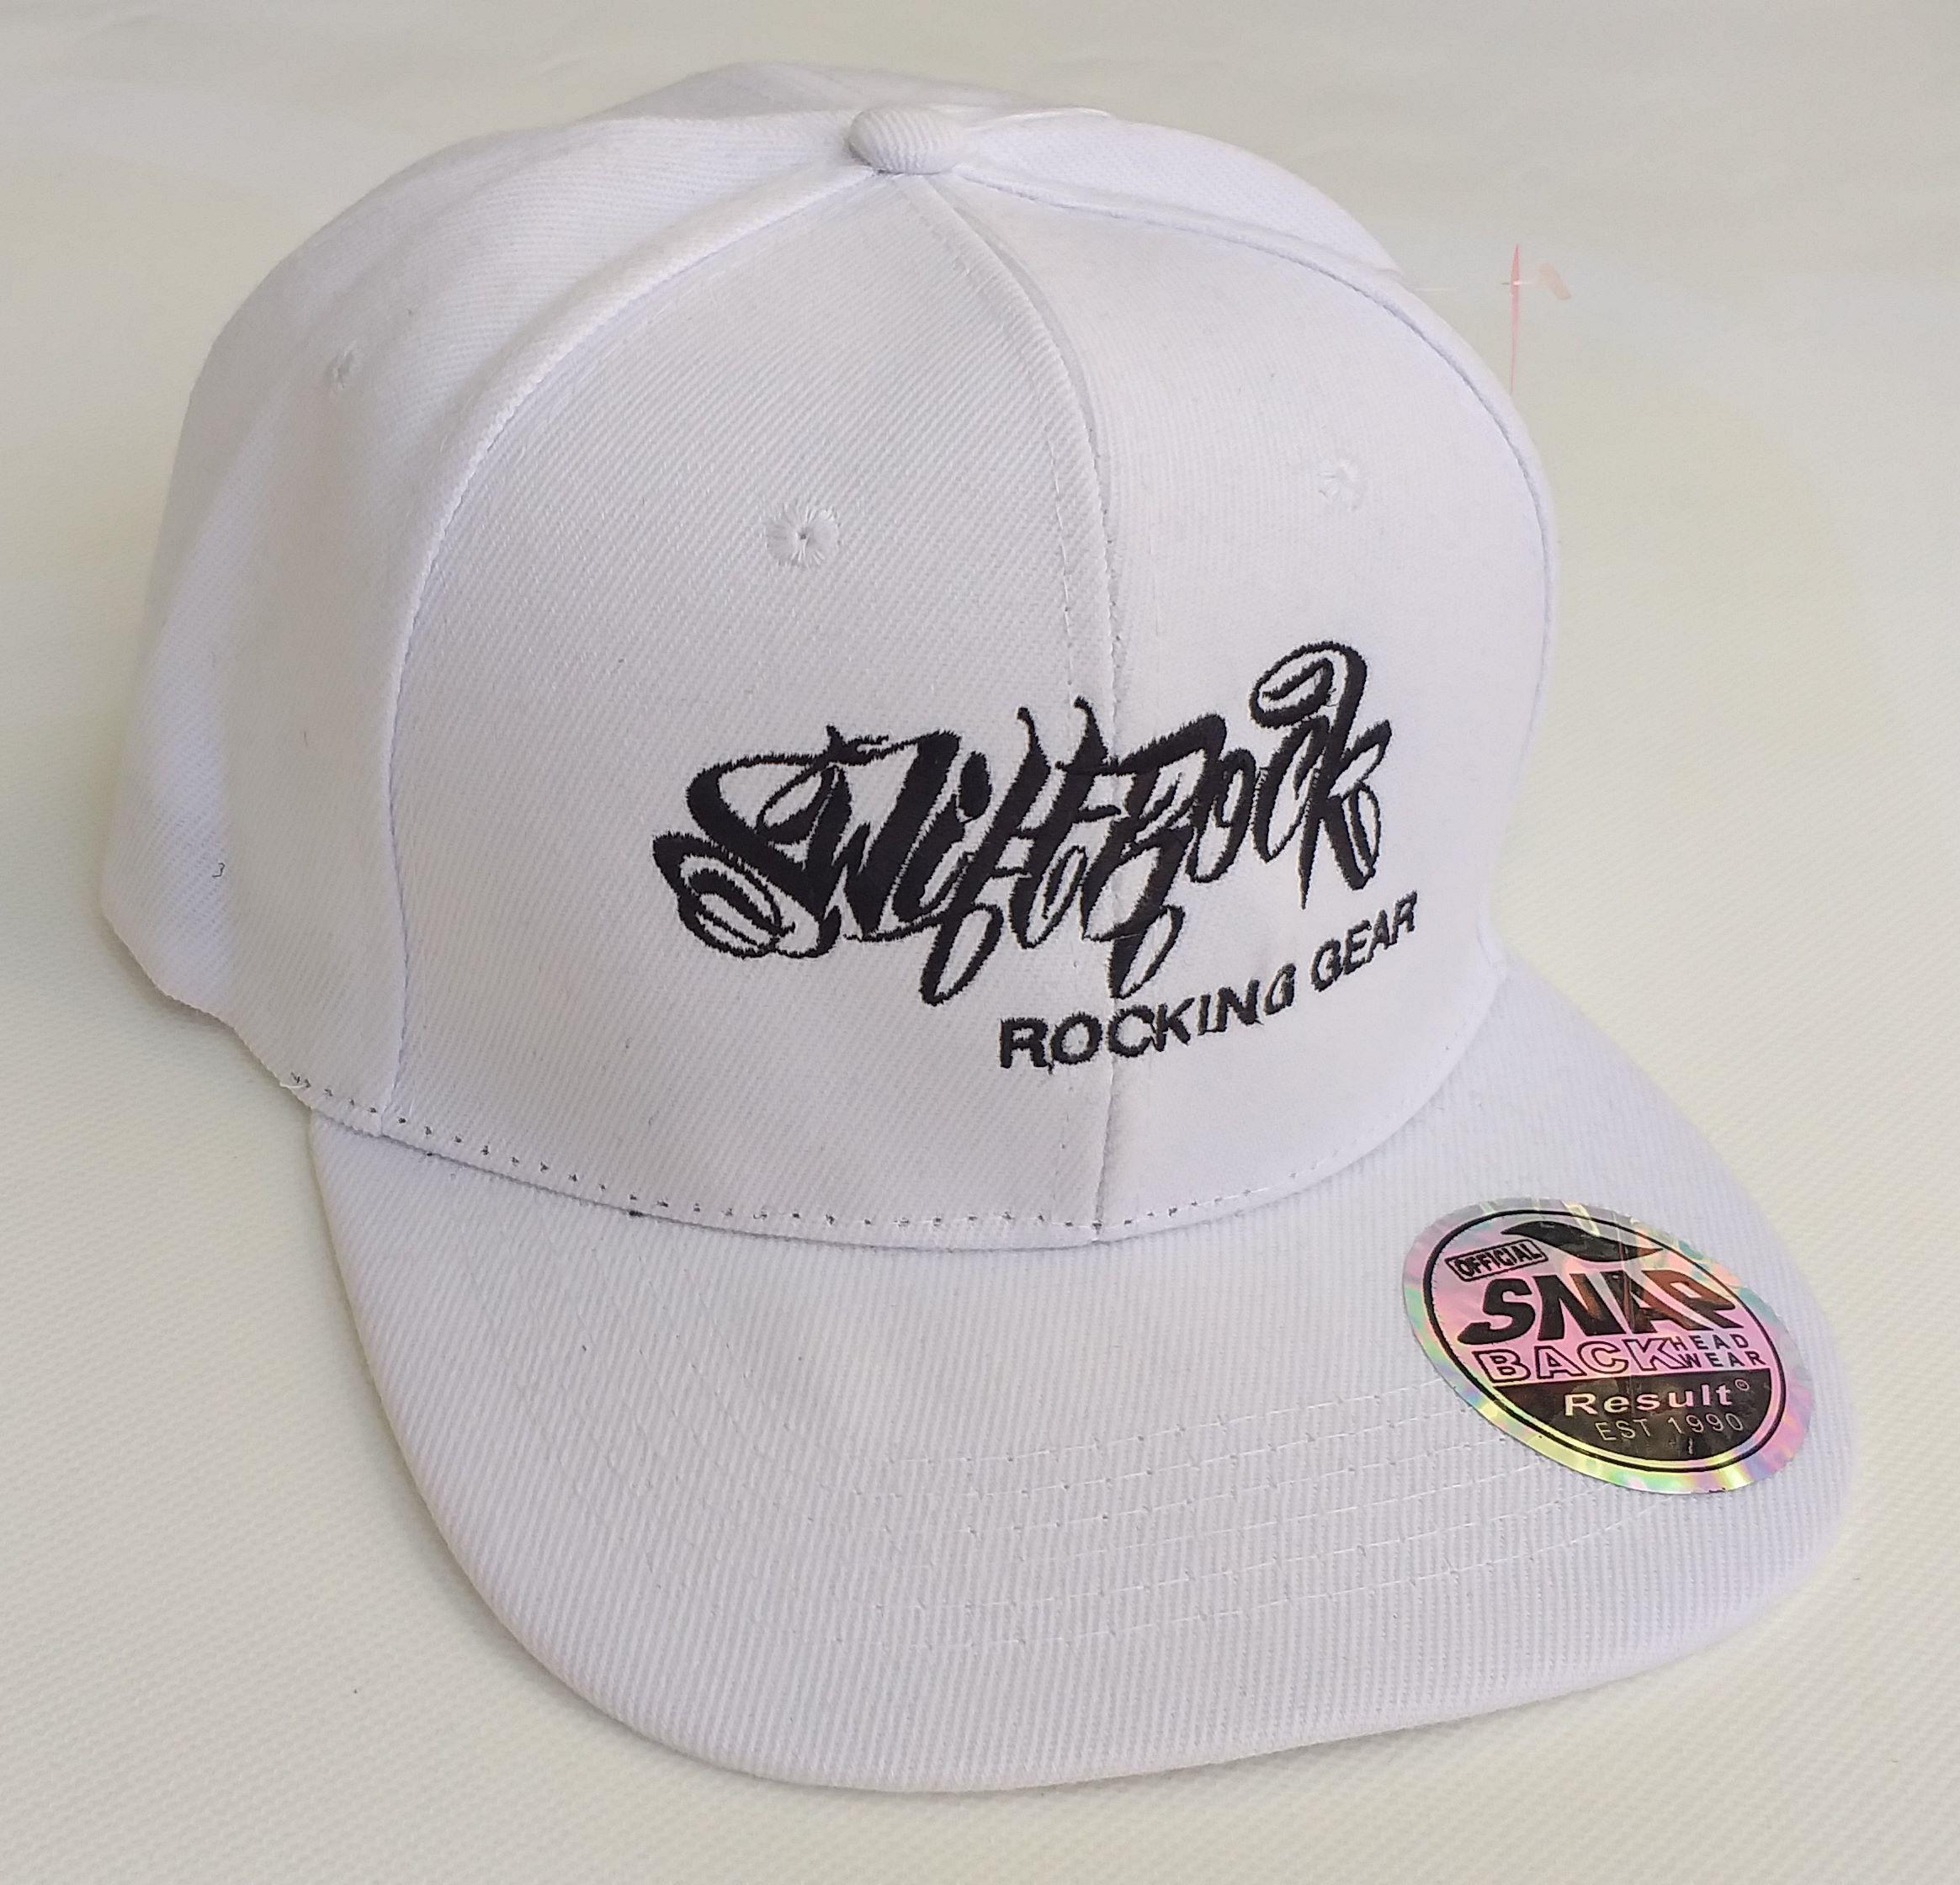 528cf27d7c0 Swift Rock Shop - Official Store - Rocking Gear Snapback Logo Cap White